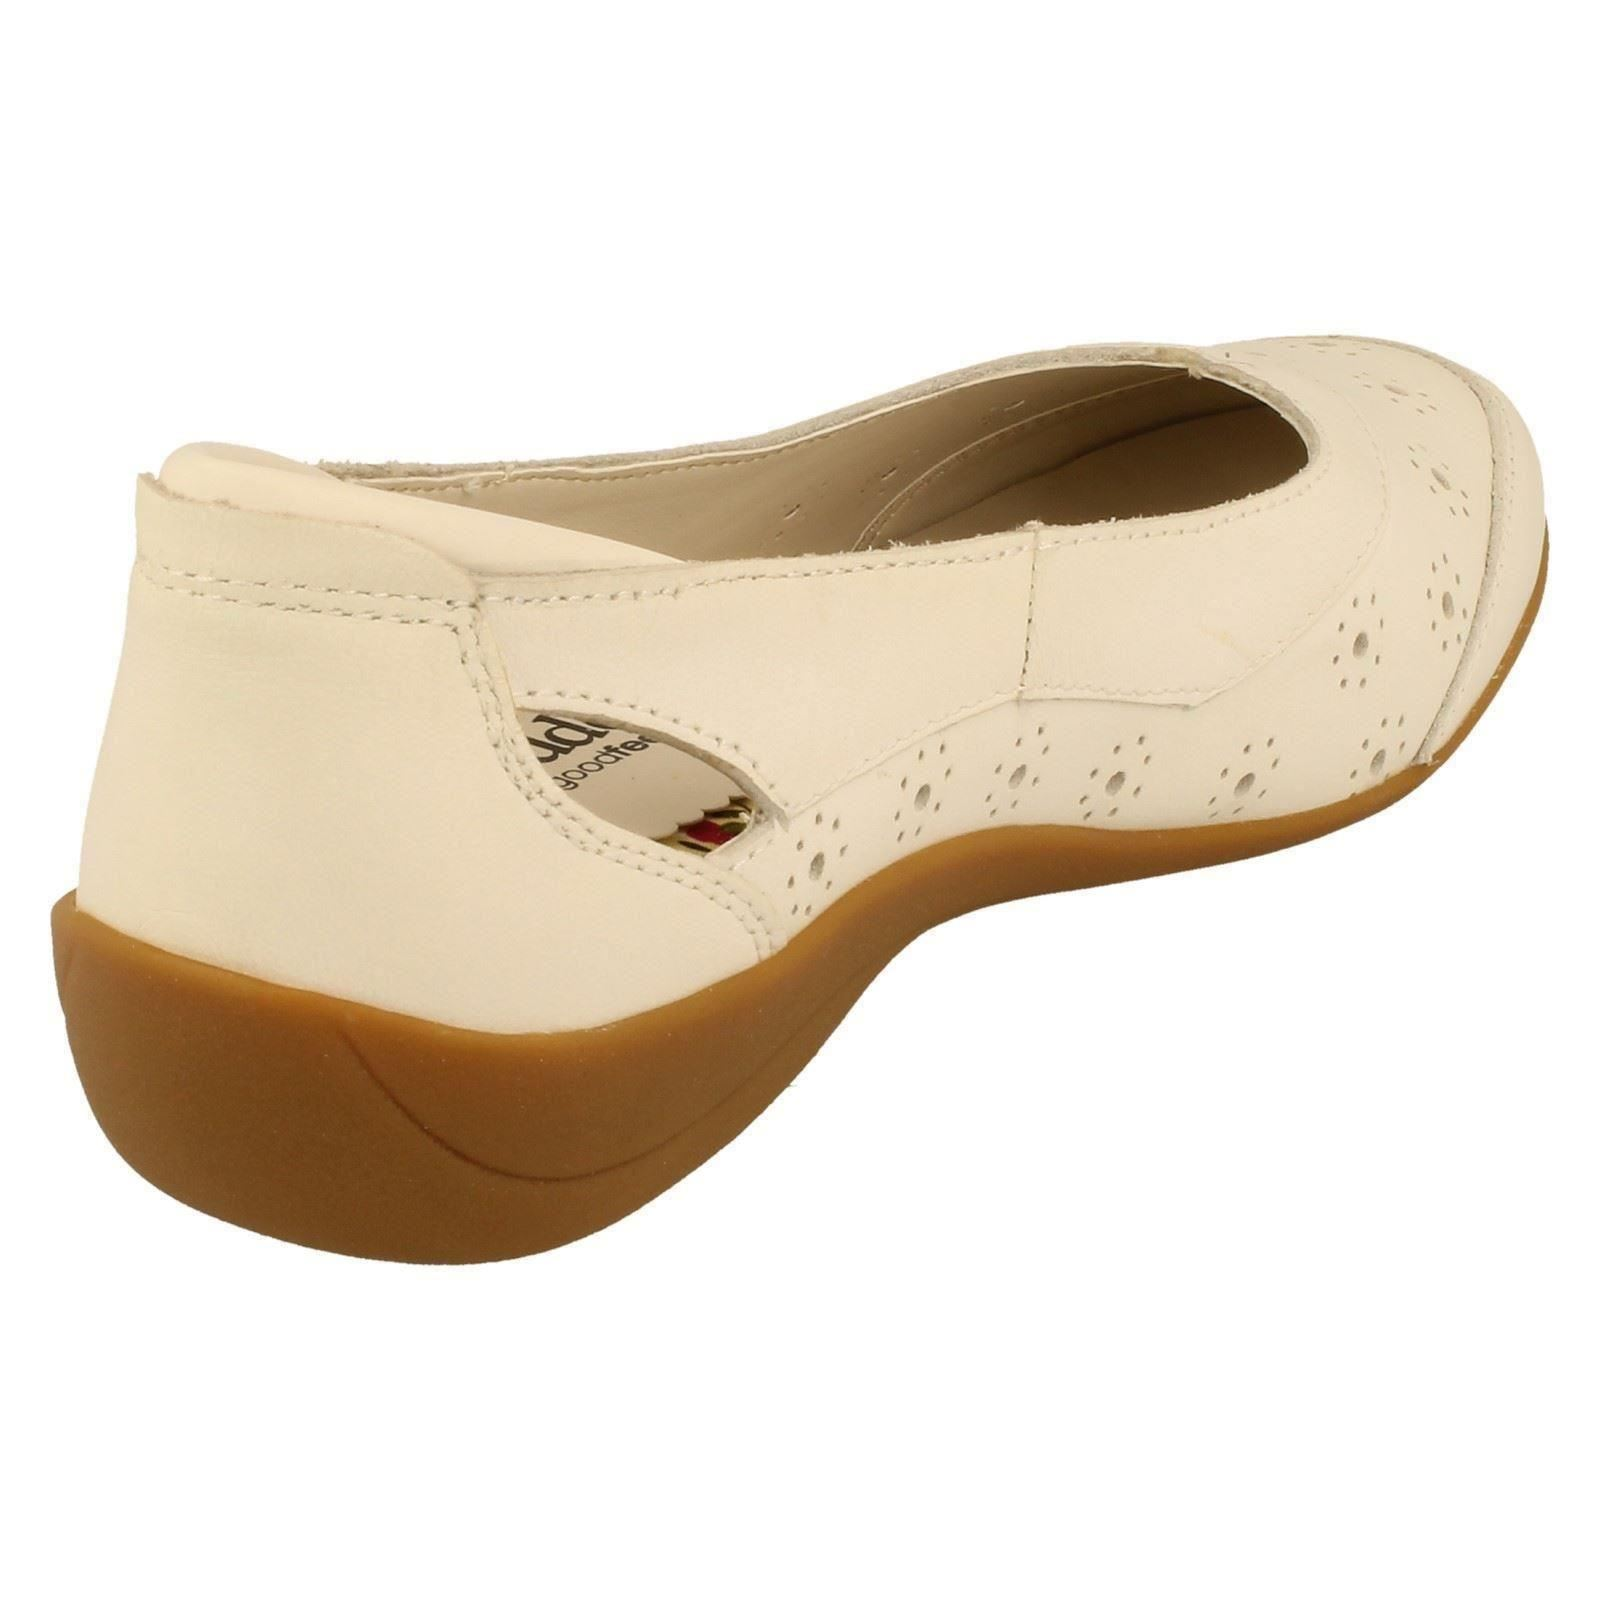 Gola Bullet Suede, Sneaker Donna, Grigio (Graphite/off White Xg), 37 EU (T3J)